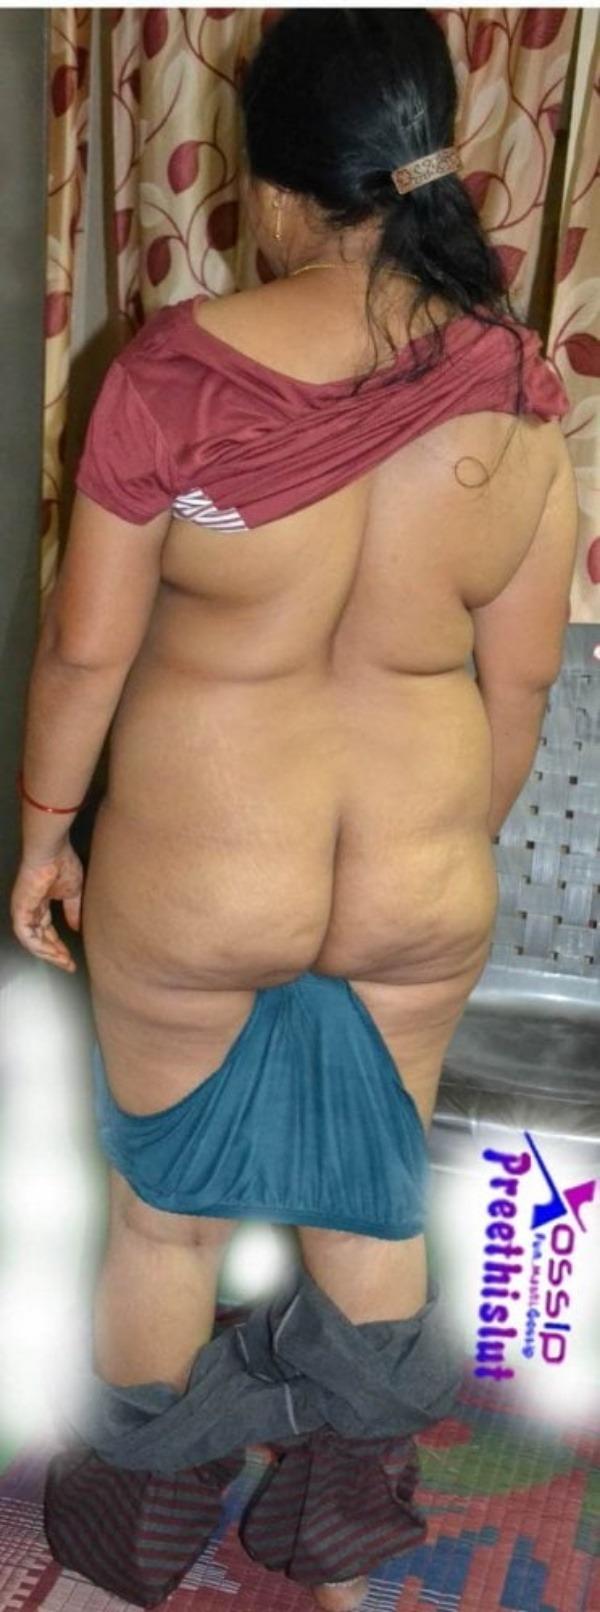 sexy mallu nude ass pussy pics - 4